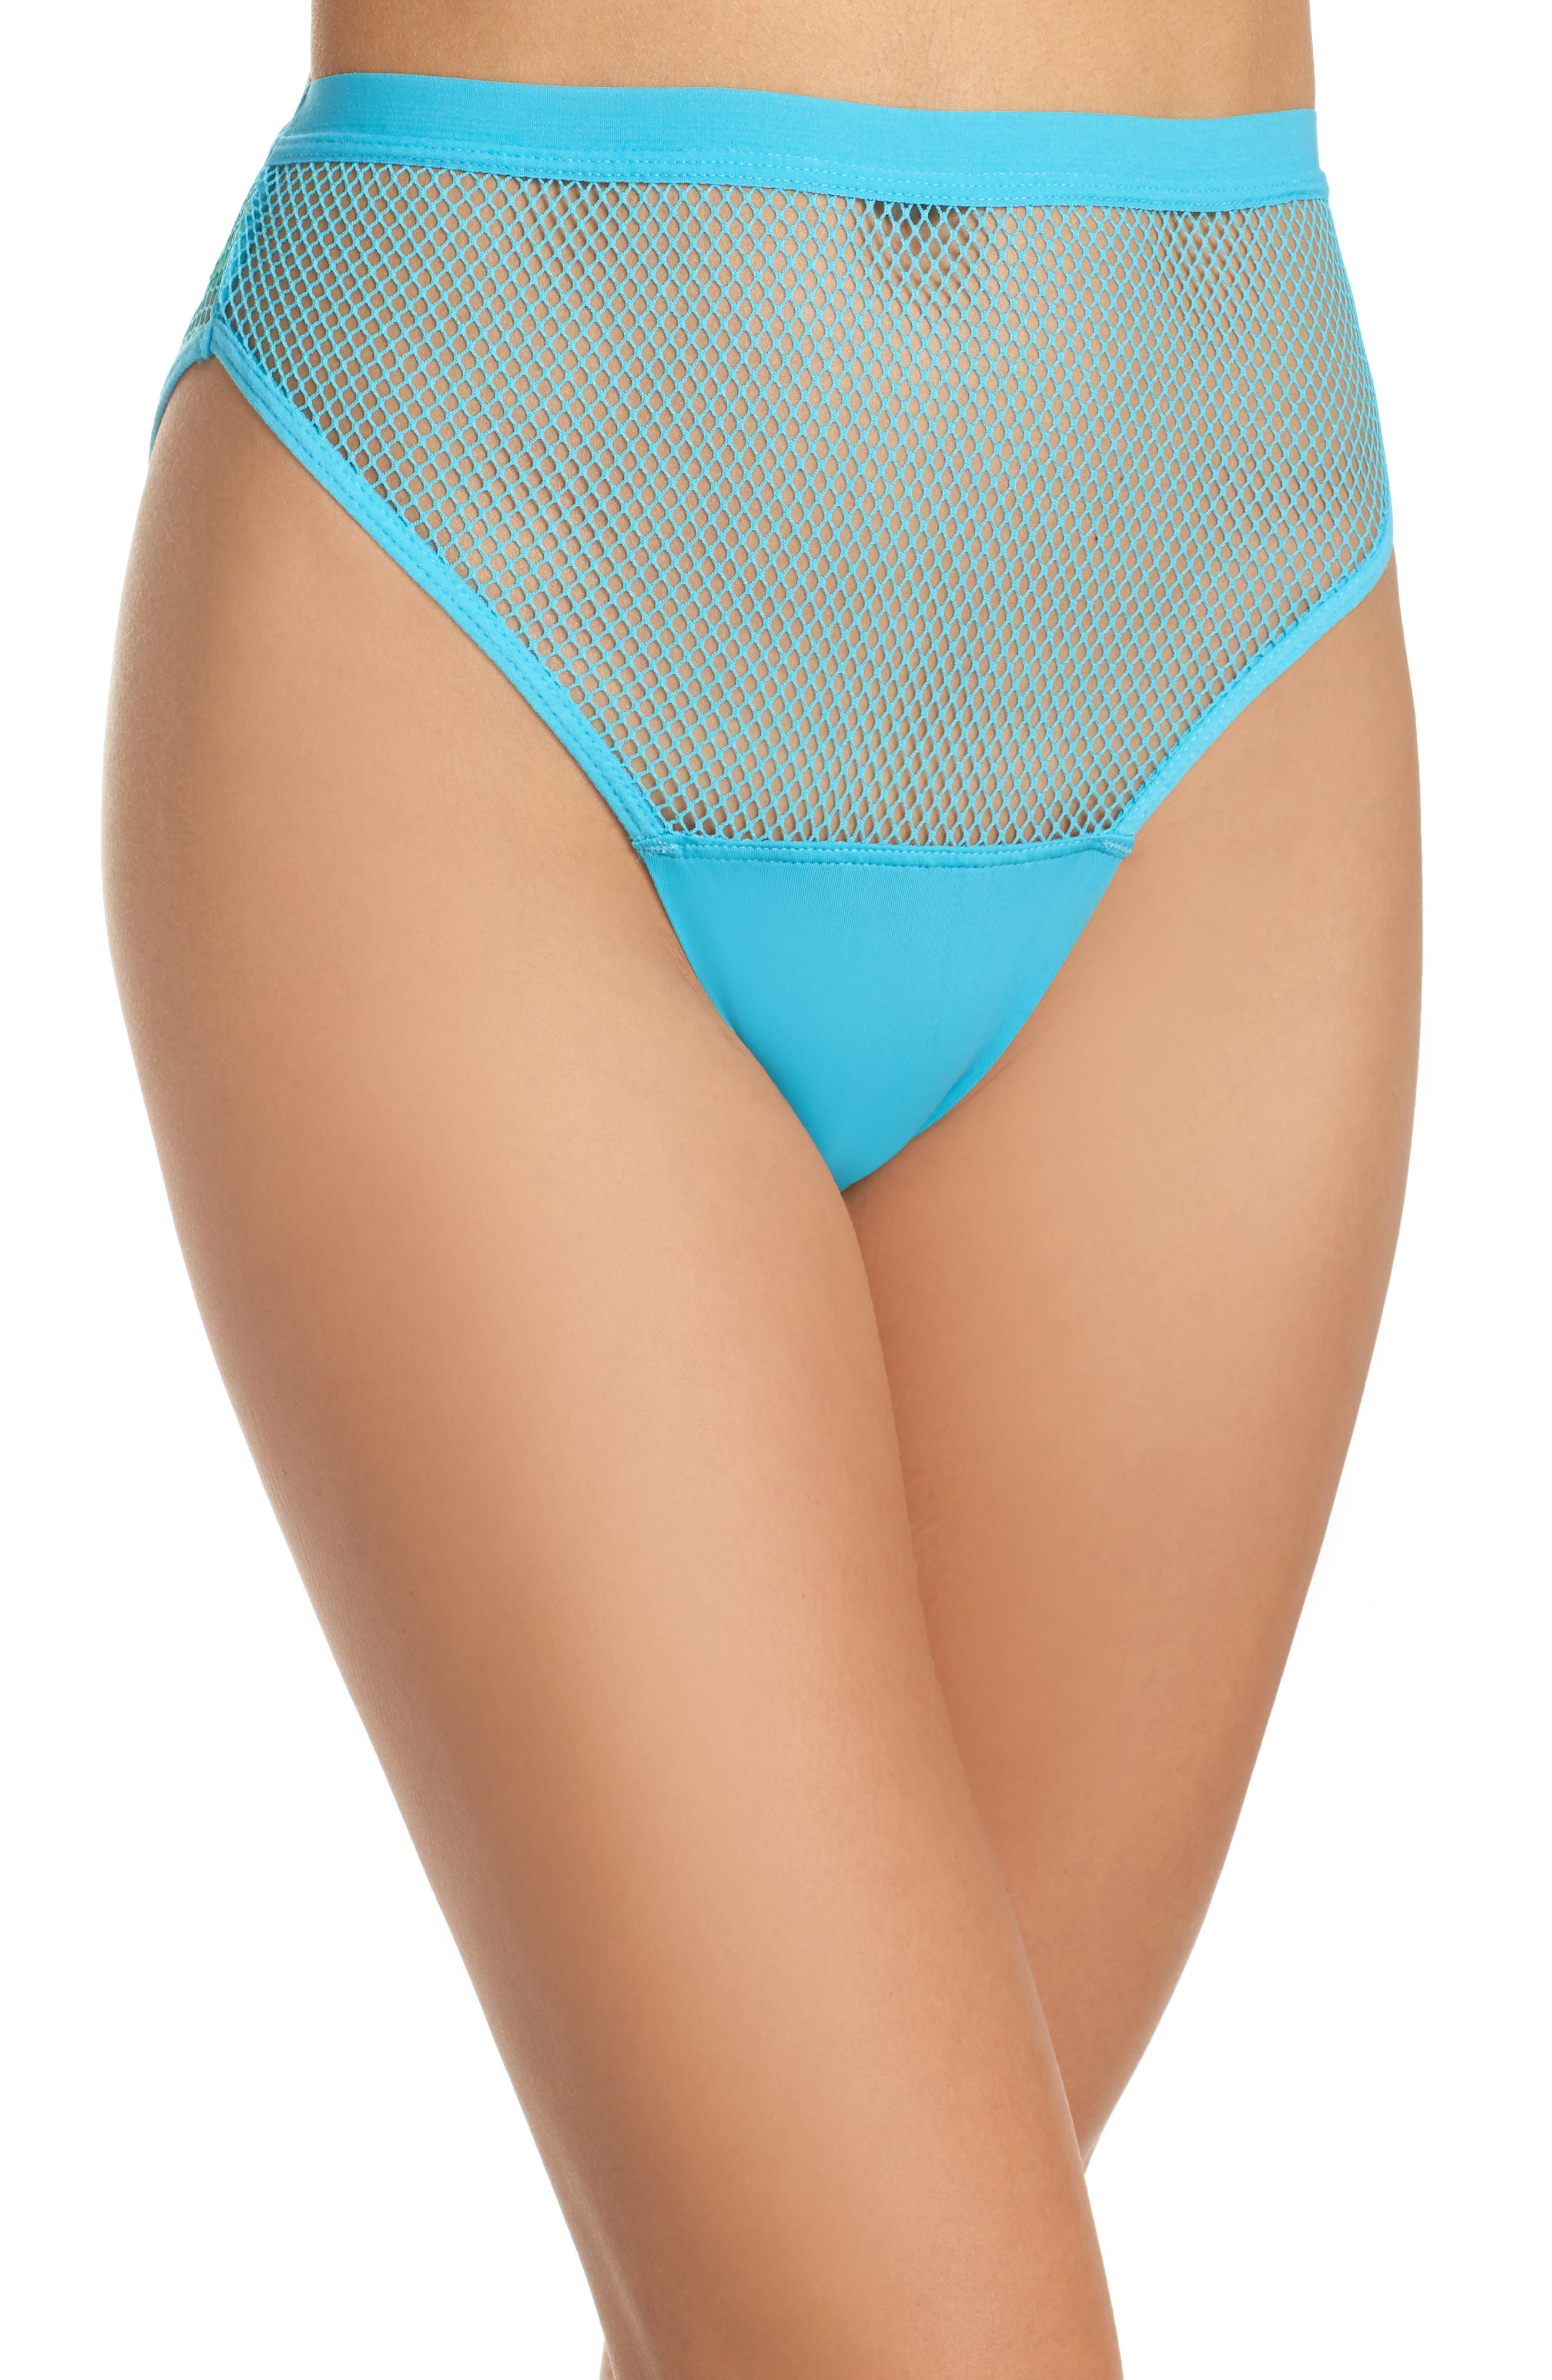 Honeydew High Waist Fishnet Panties,                             Main thumbnail 1, color,                             Sea Breezer